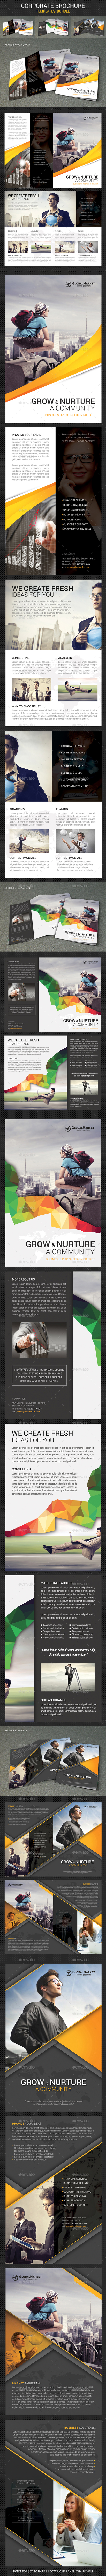 Corporate Brochure Bundle - Corporate Brochures